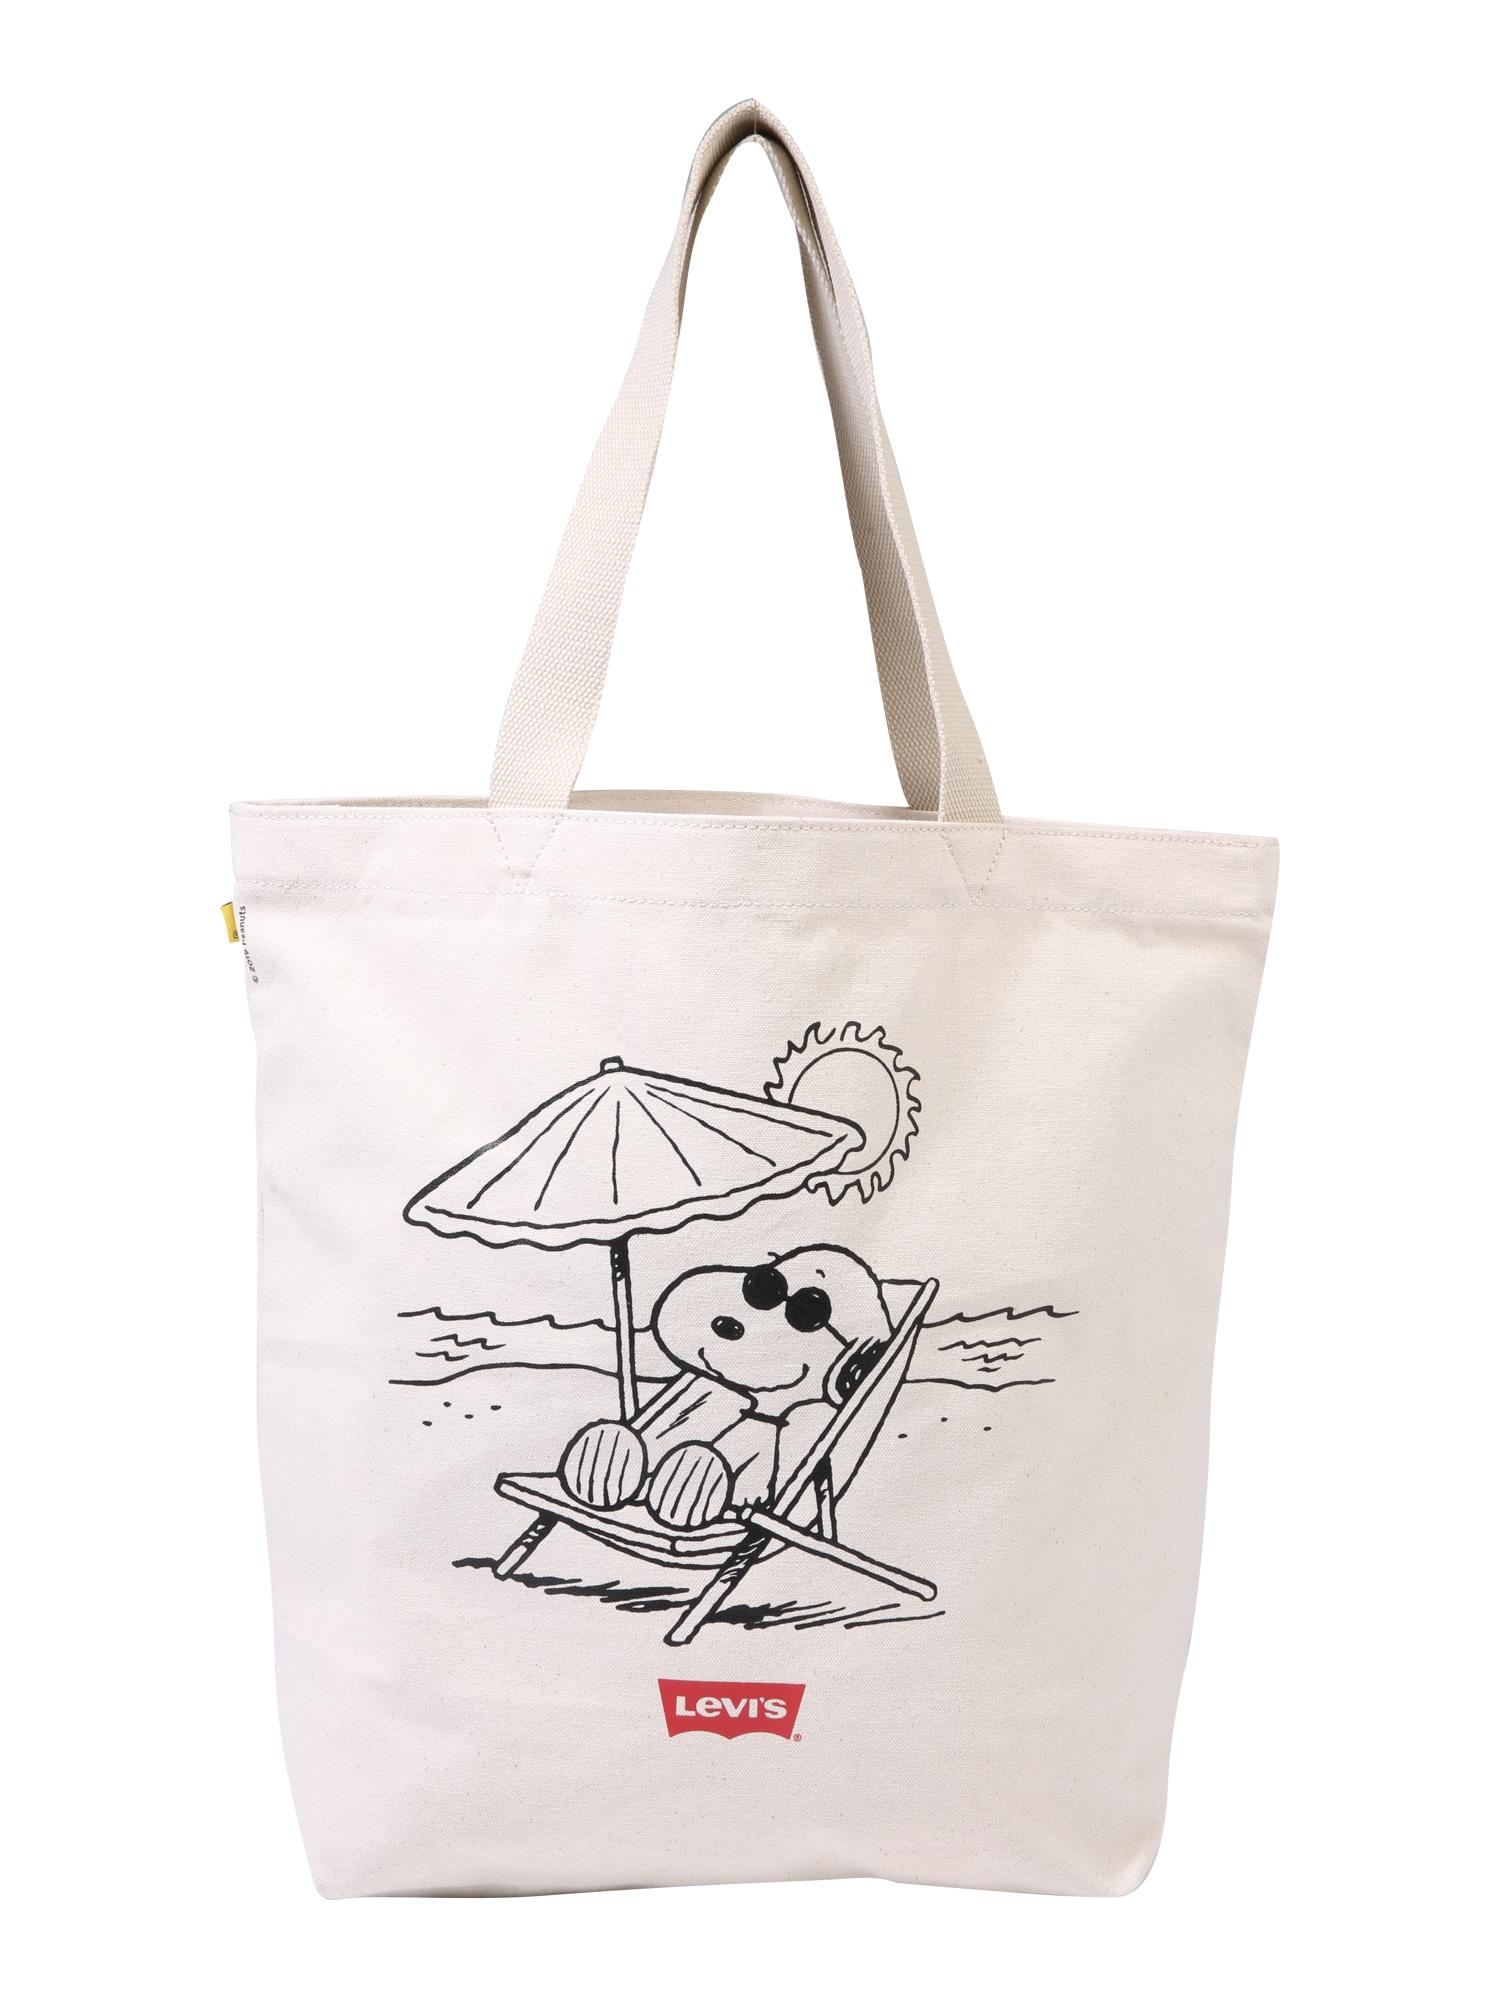 LEVIS Nákupní taška Peanuts Snoopy Levis® Beach Tote režná LEVI'S